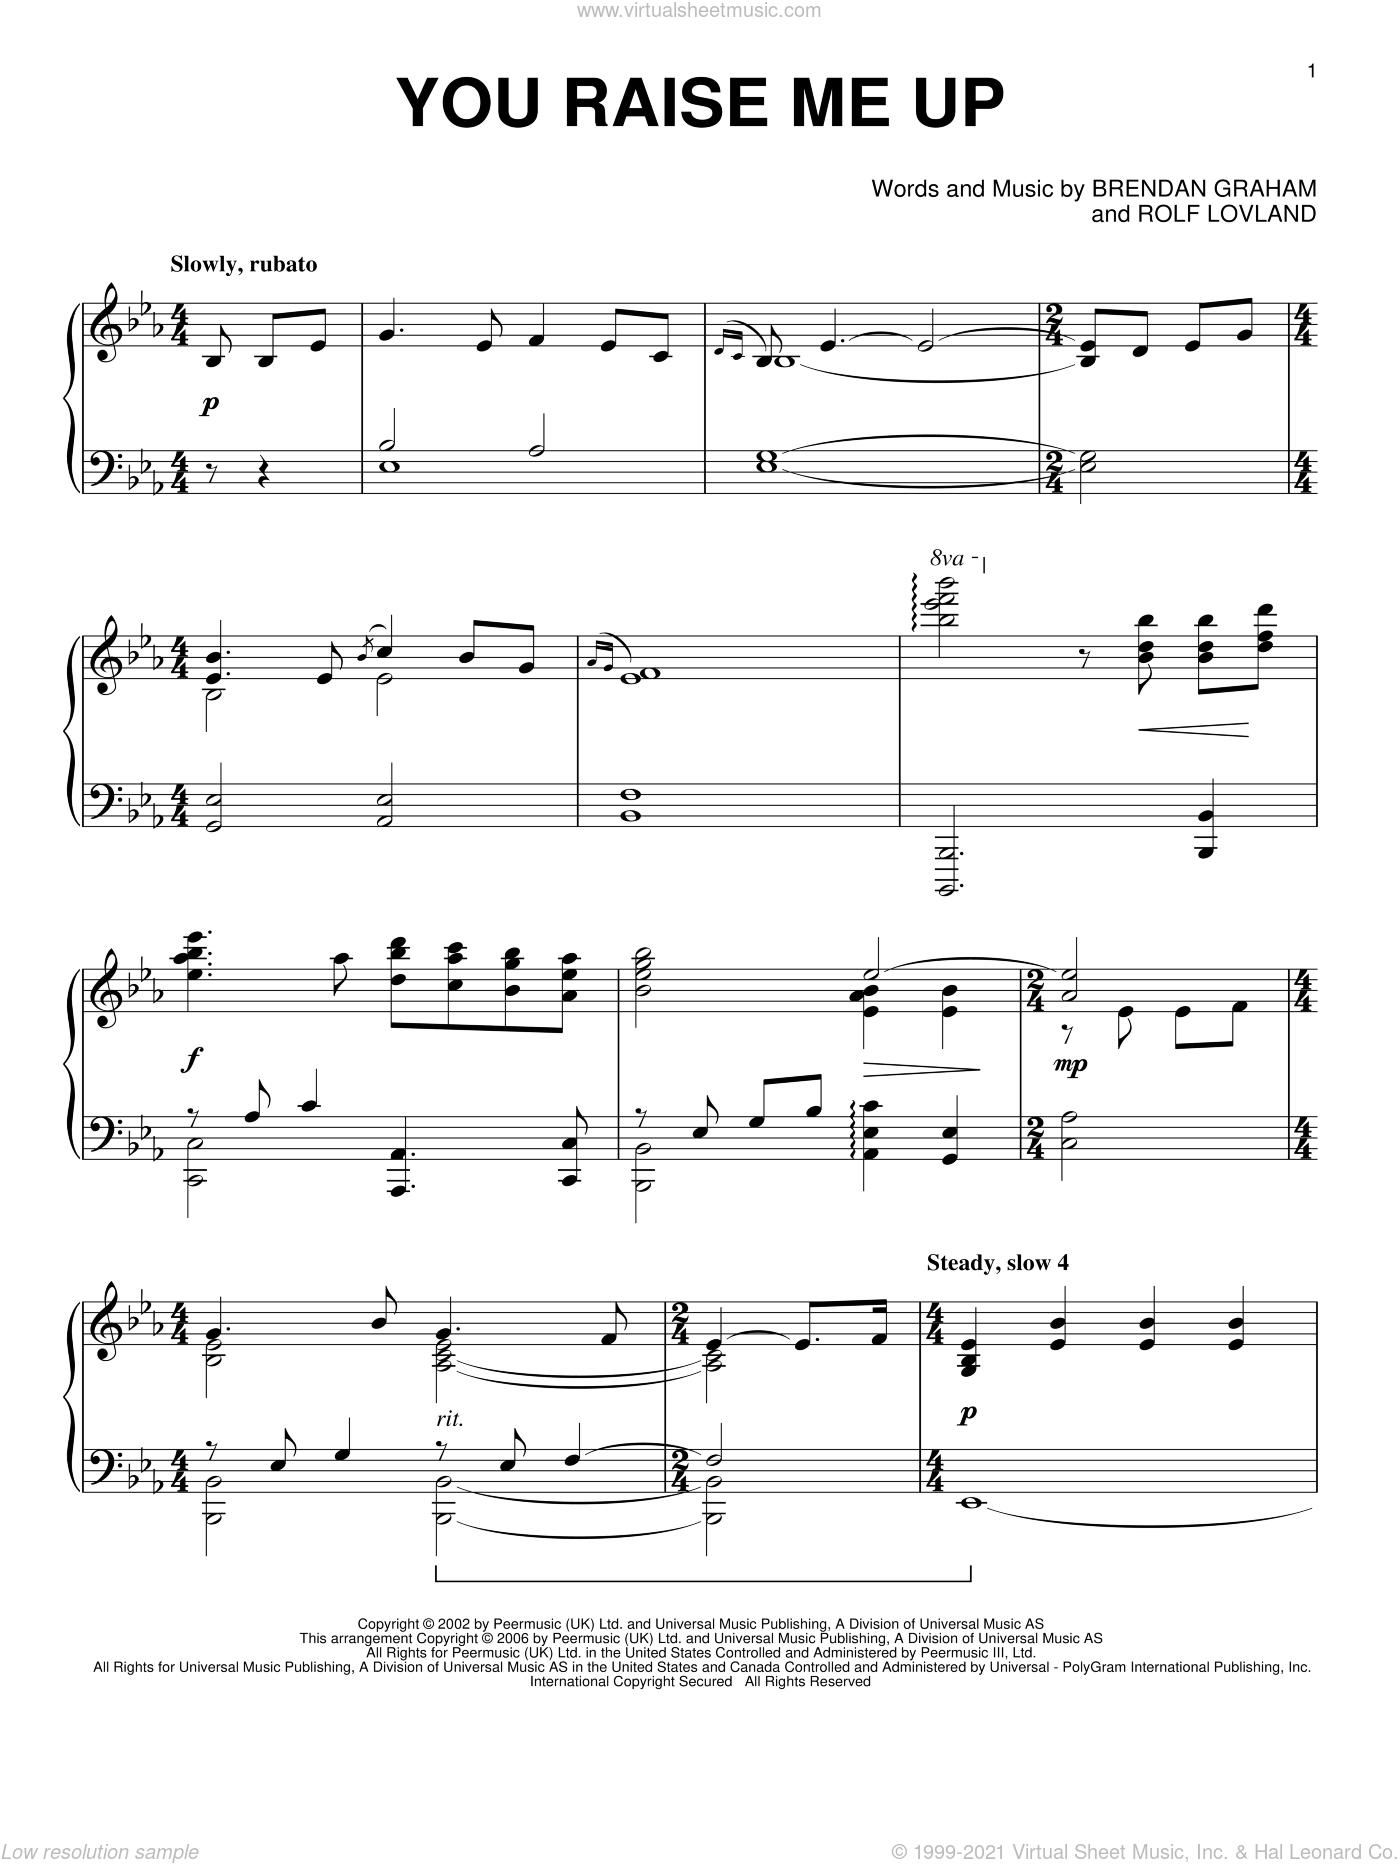 You Raise Me Up sheet music for piano solo by Josh Groban, Secret Garden, Brendan Graham and Rolf Lovland, wedding score, intermediate skill level